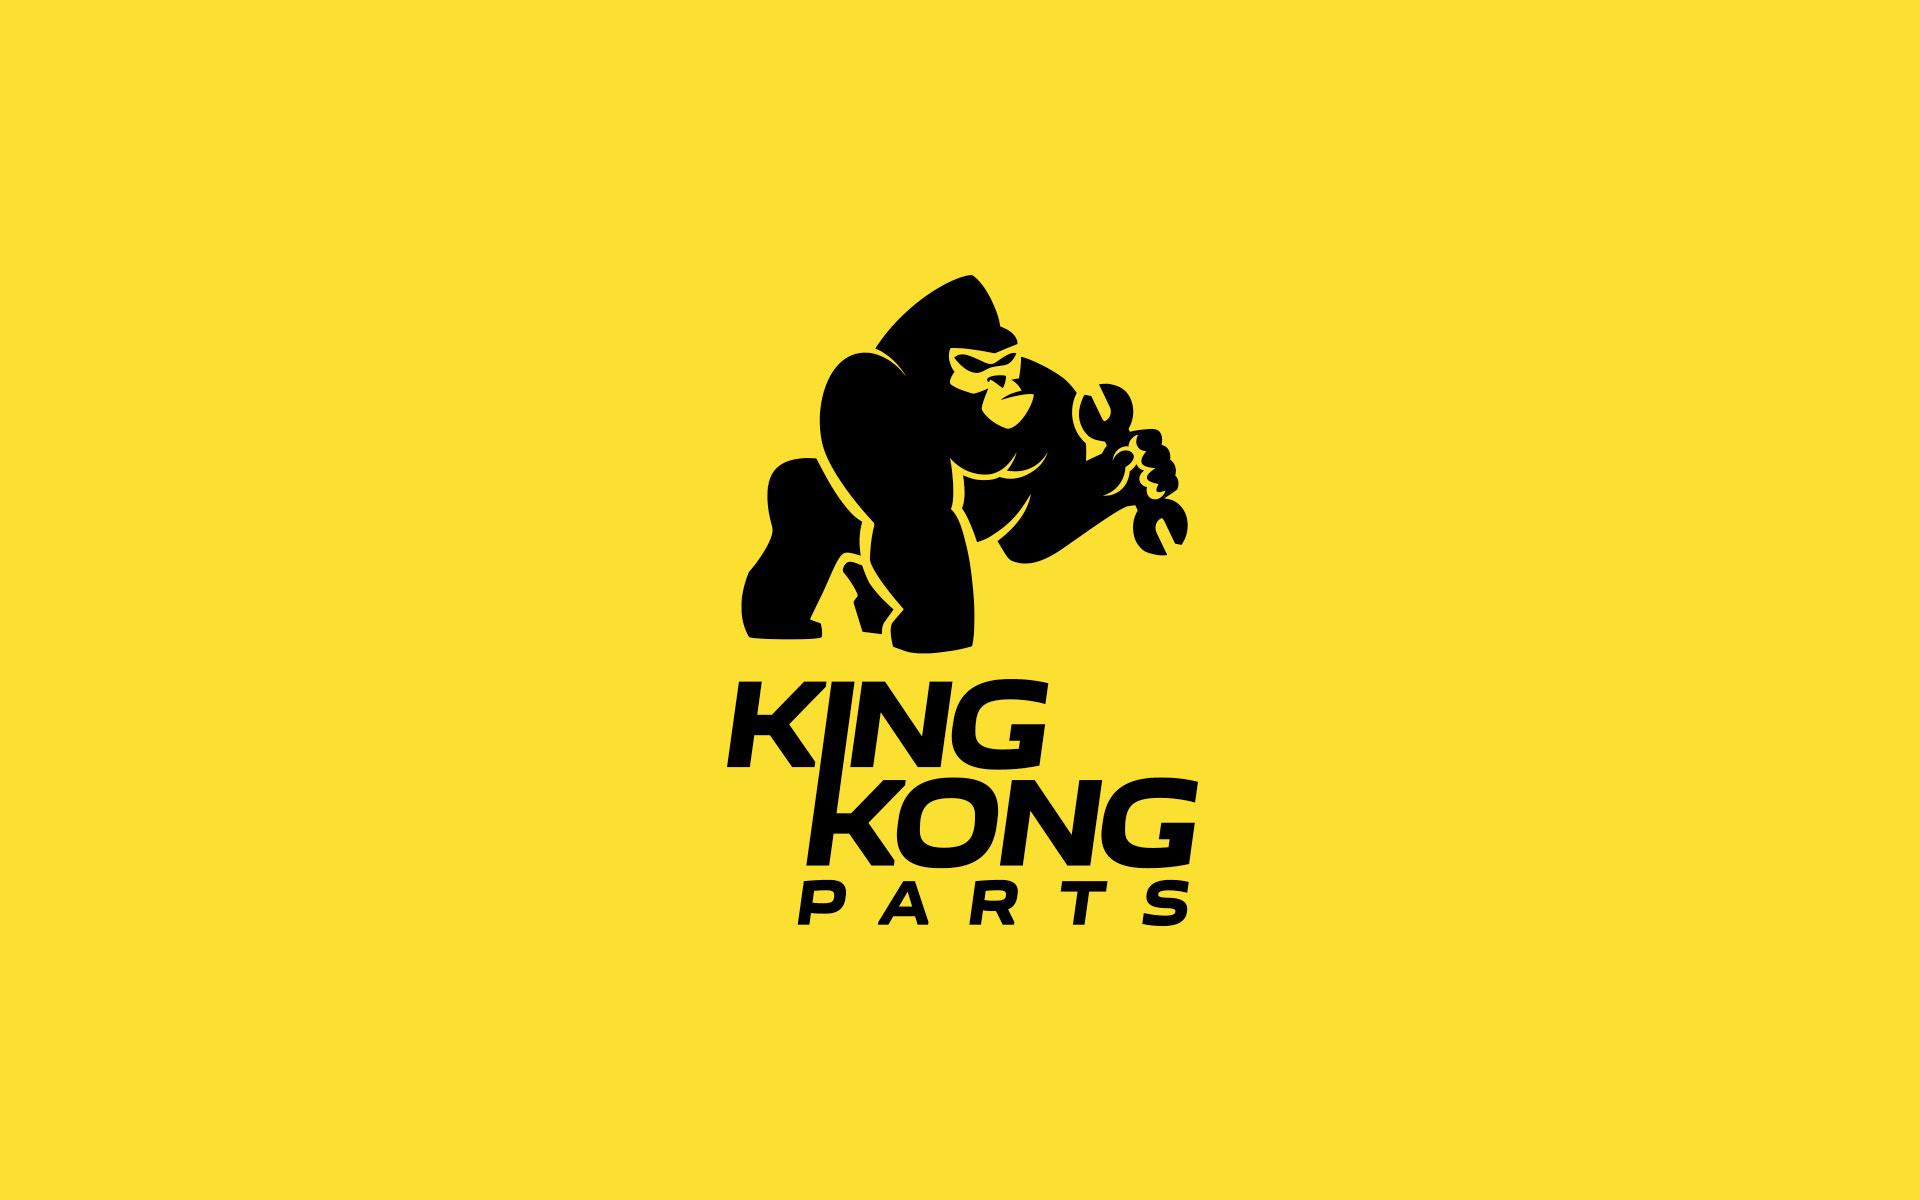 https://sconcept.be/wp-content/uploads/2019/04/kingkongparts-1.jpg